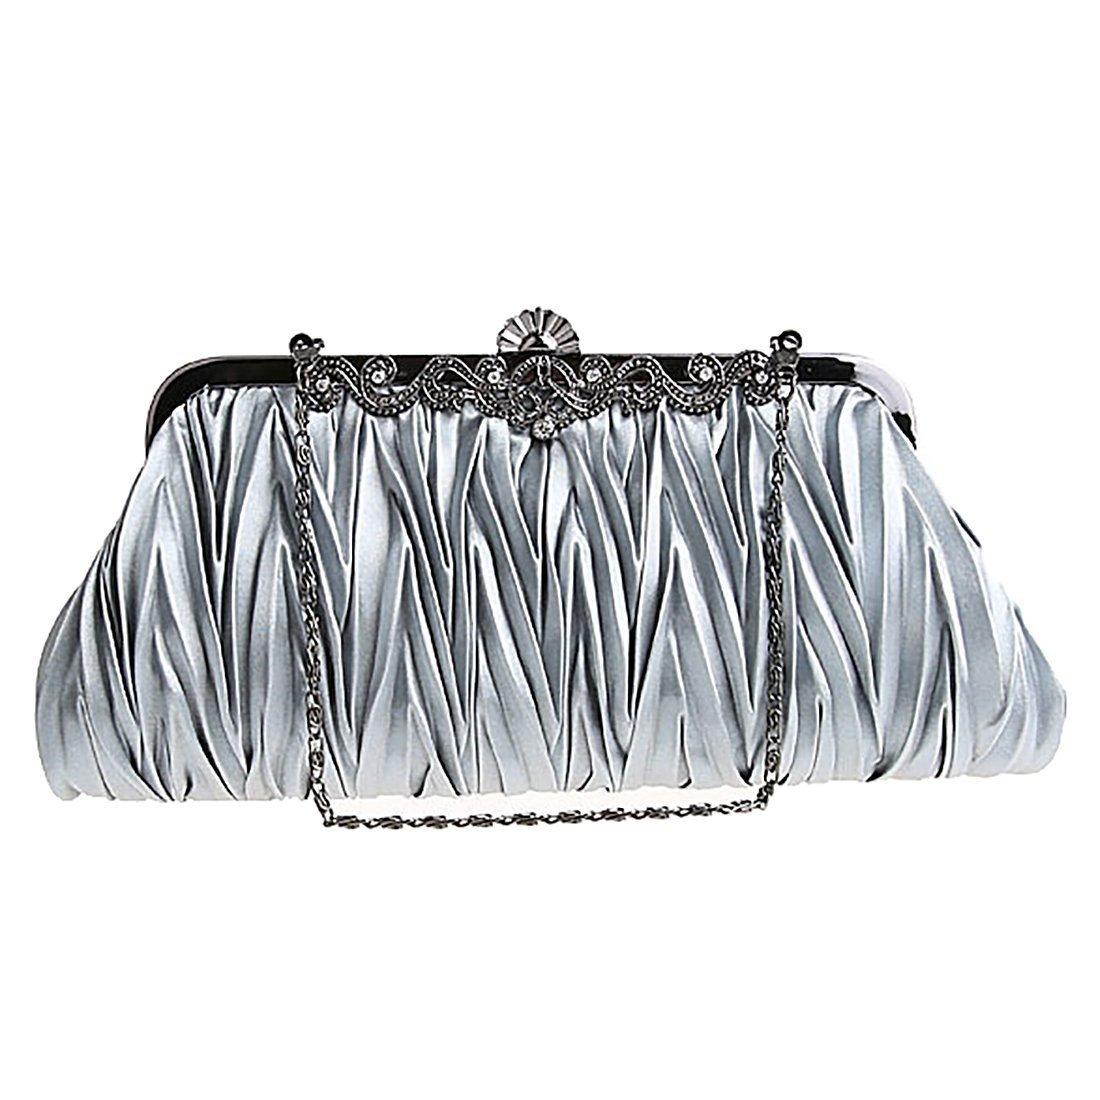 EROUGE Satin Purse Wallet Fashion Ladies Cocktail Evening Handbags Women Elegant Envelope Clutch (Gray)